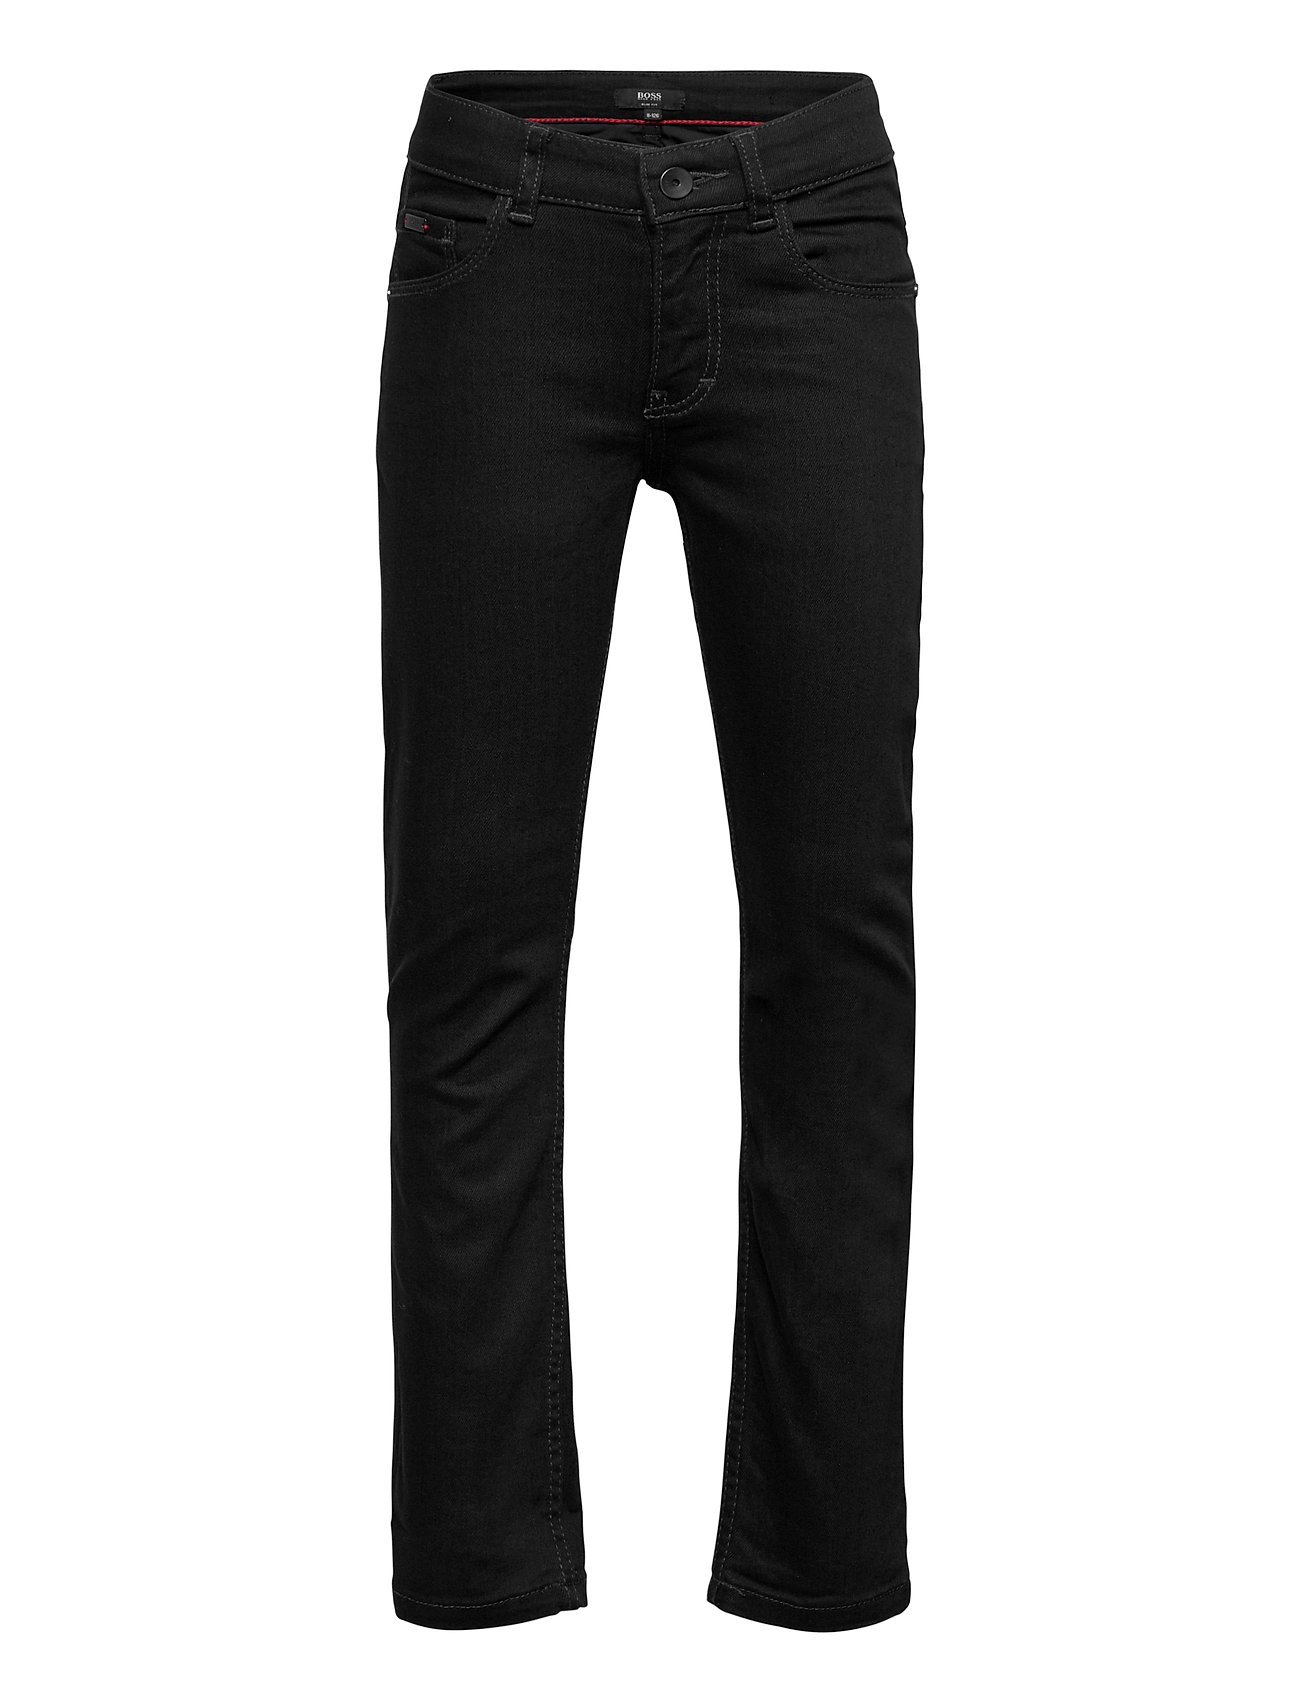 Image of Denim Trousers Jeans Sort BOSS (3433040299)